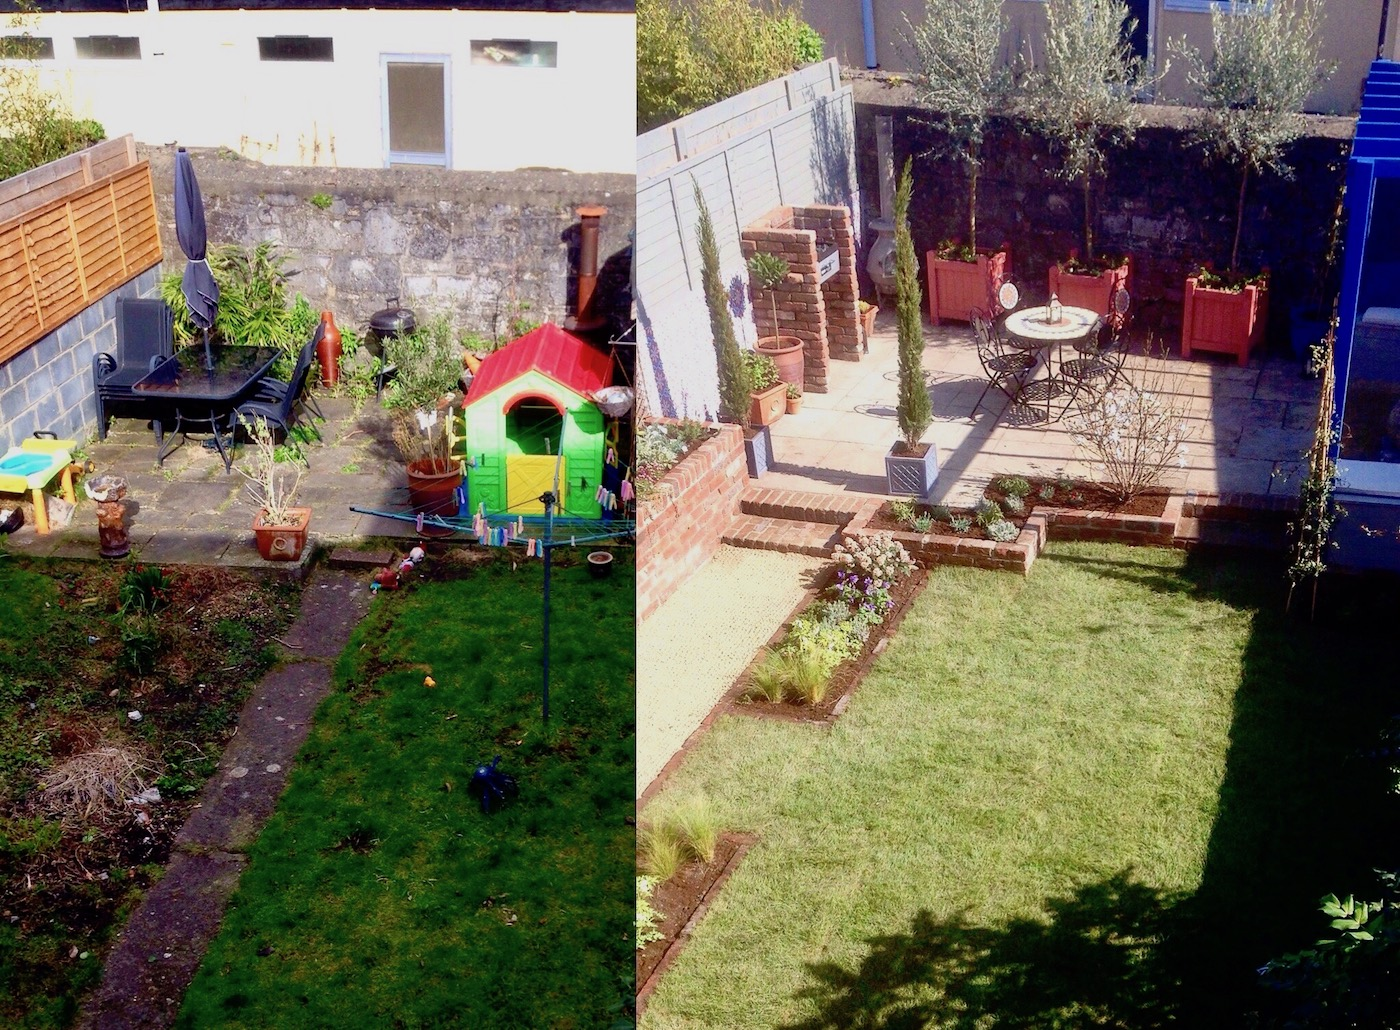 super-alex-alexandra-hollingsworth-garden-design-12.jpg